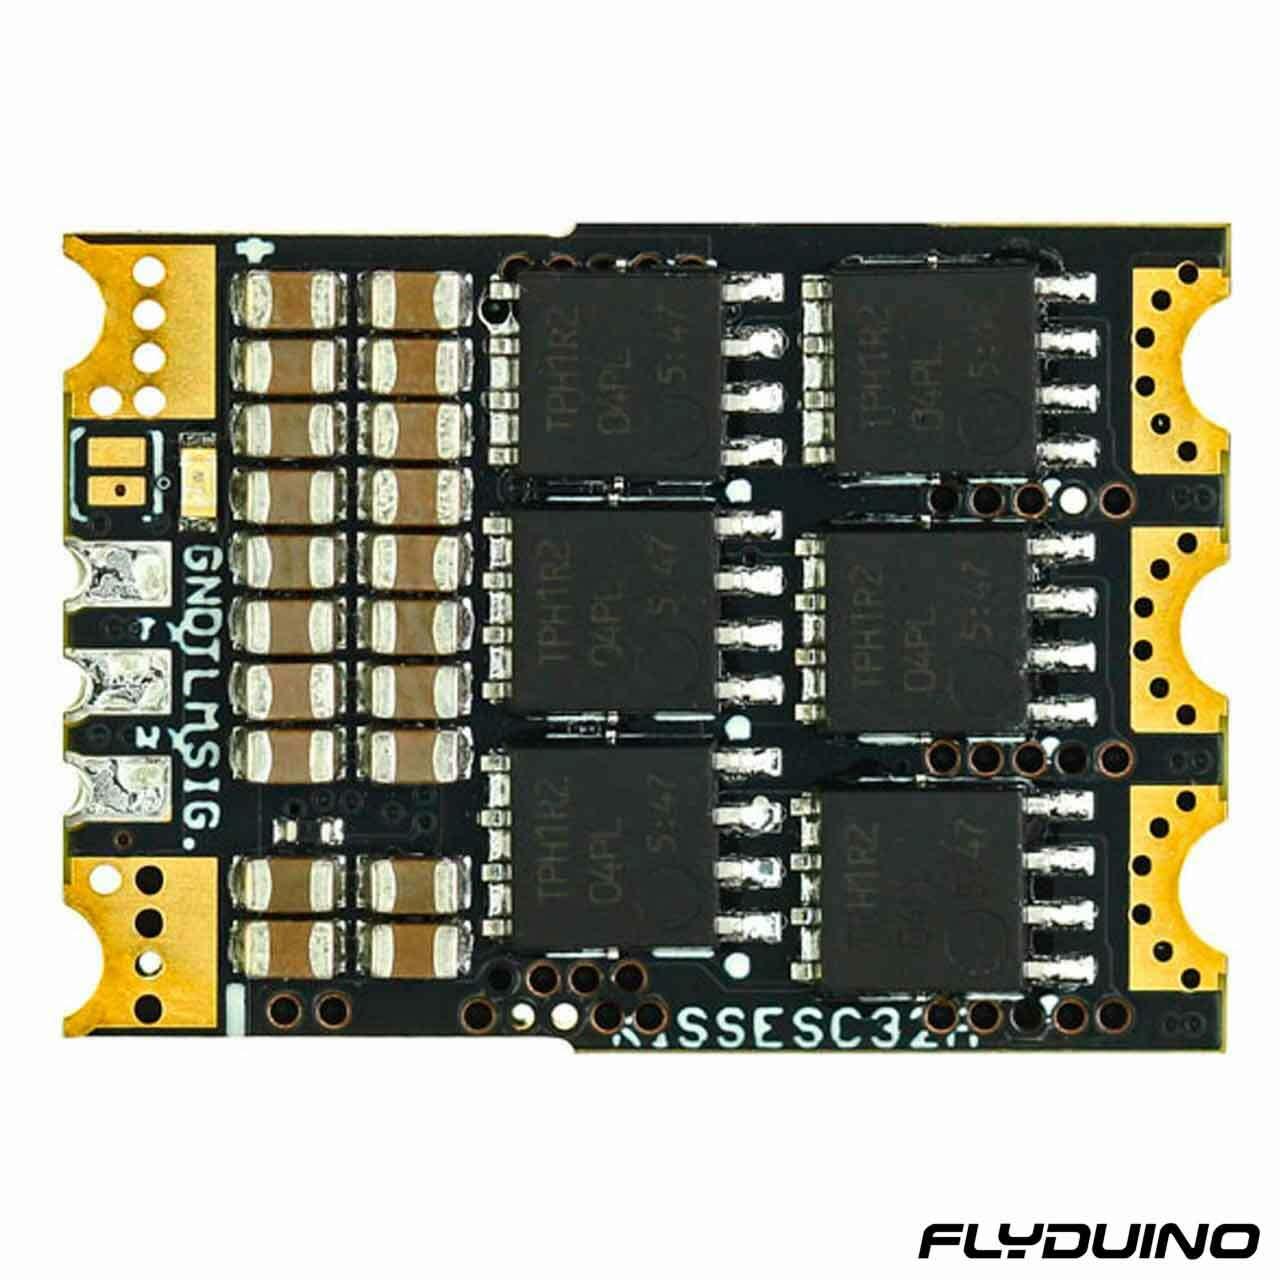 FLYDUINO KISS ESC 2-6S 32A (45A limit) - 32bit brushless Motor Ctrl